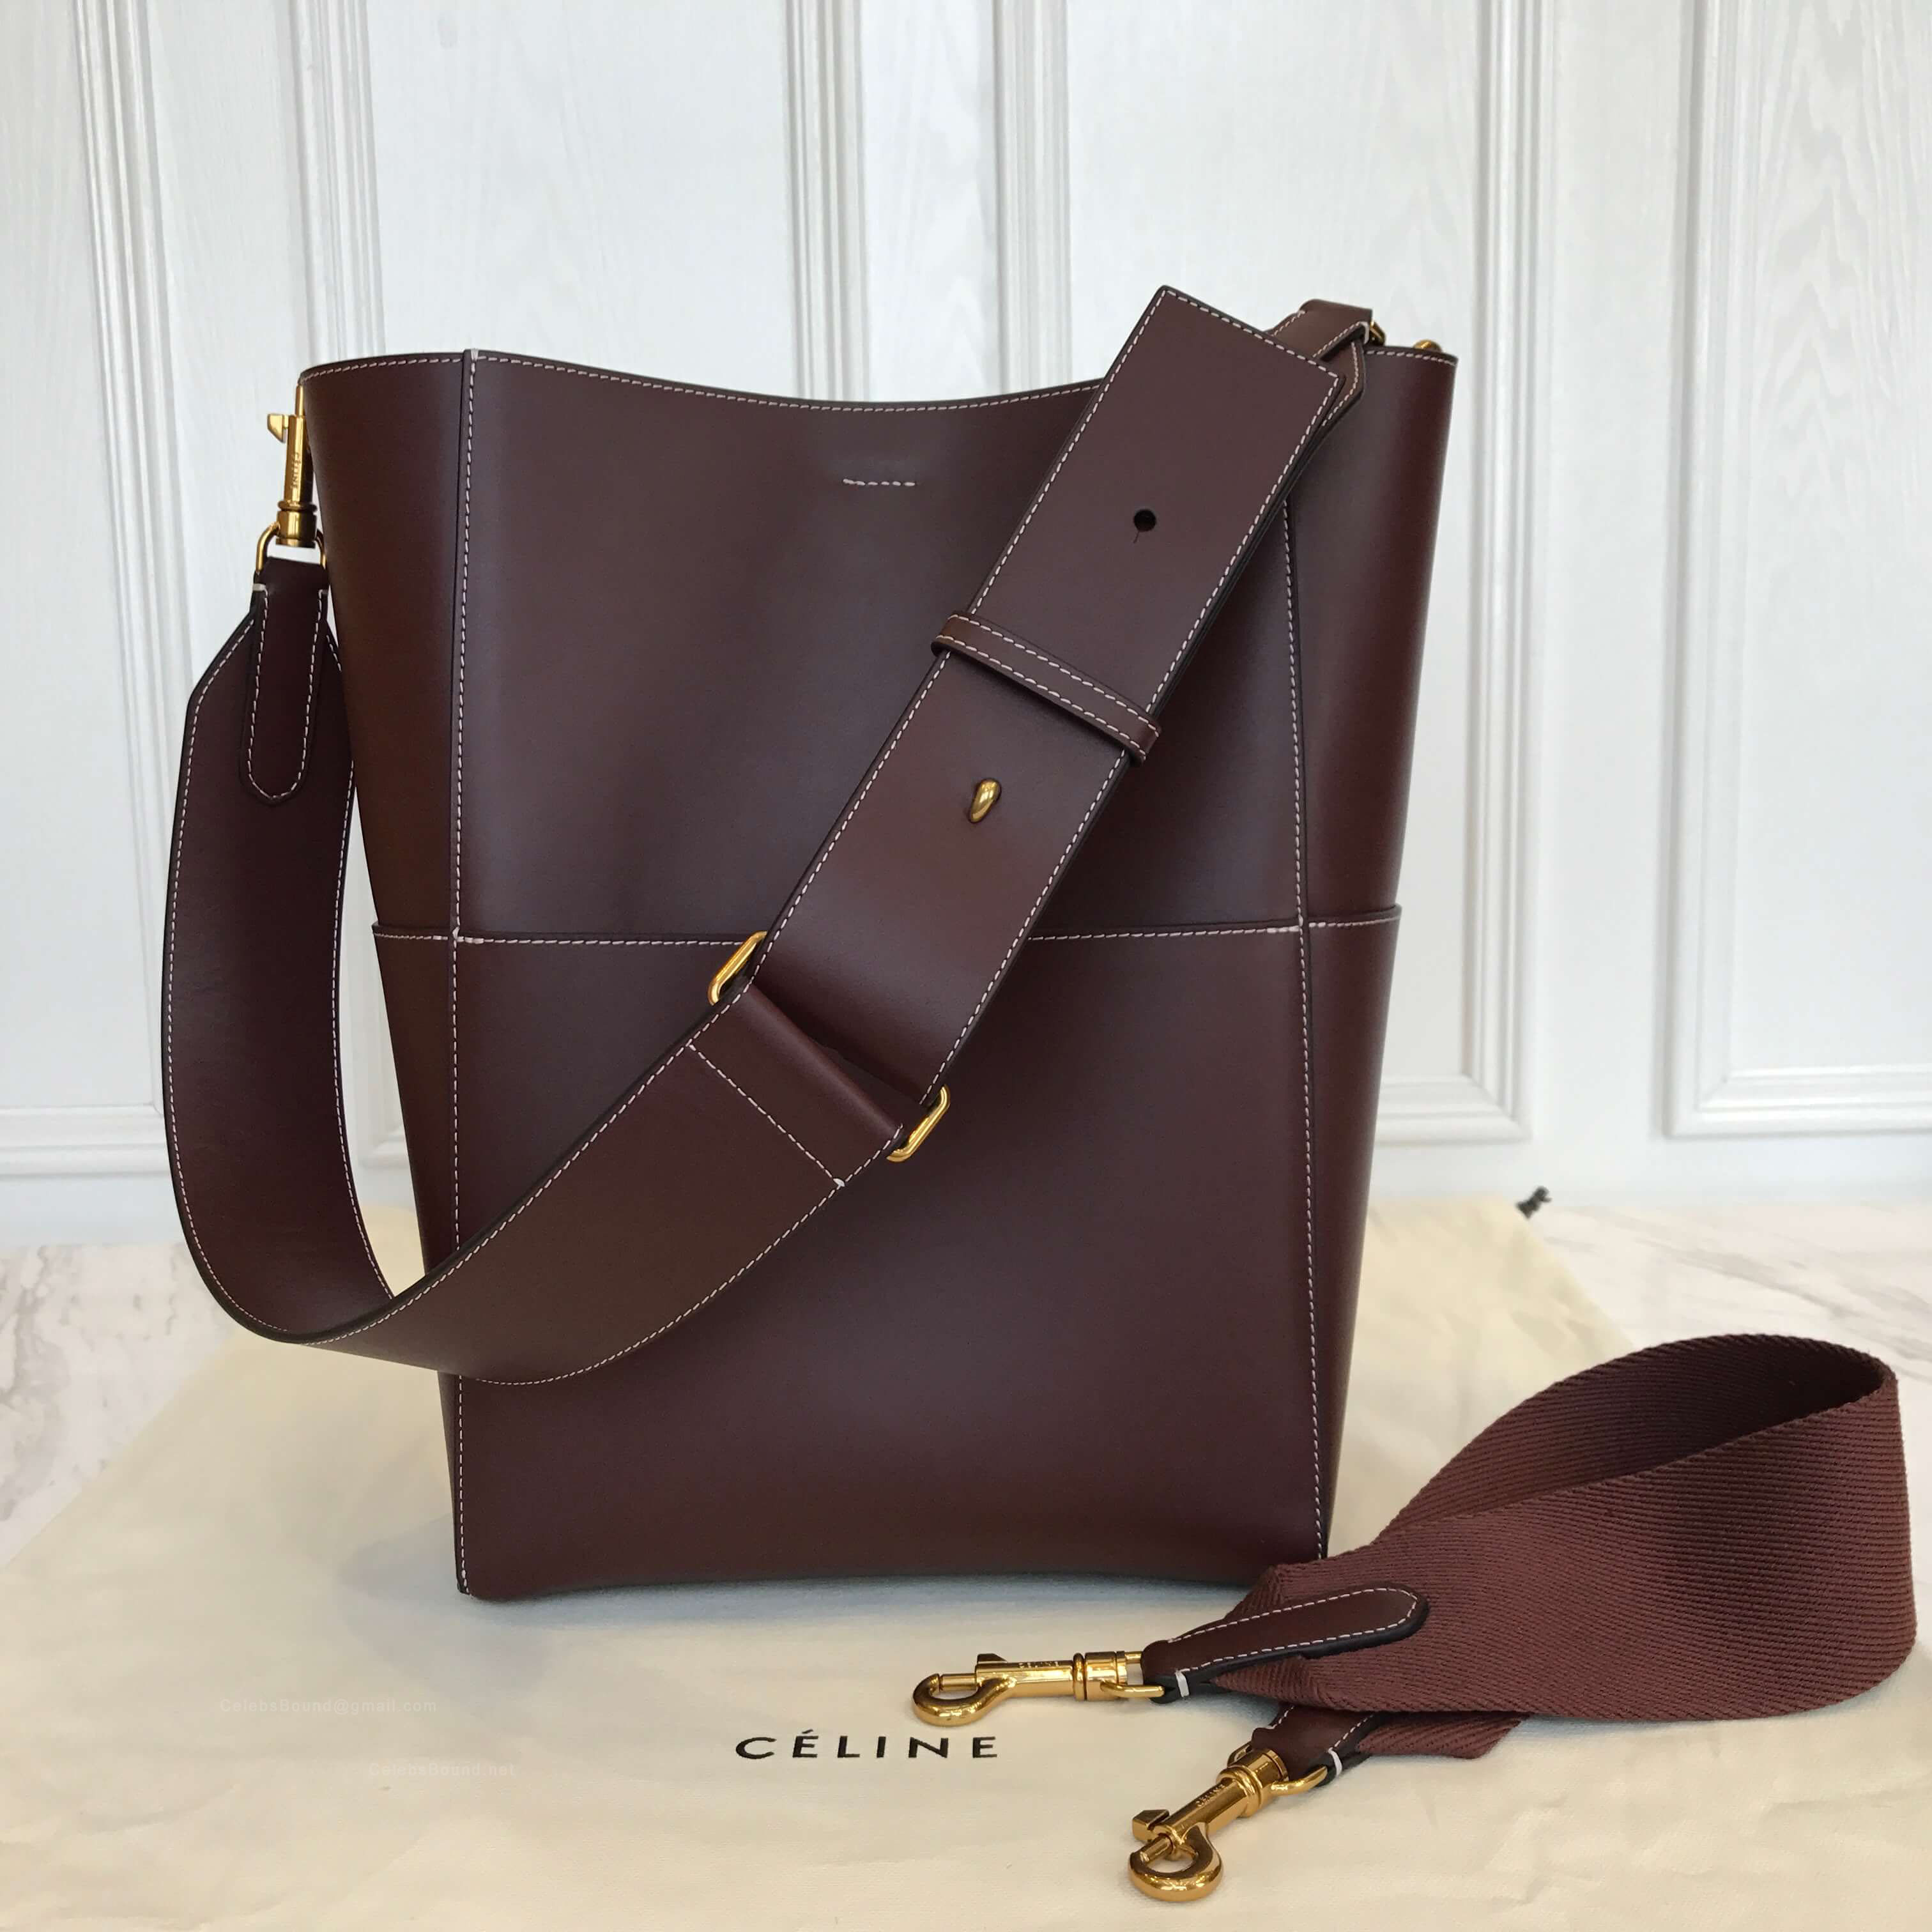 0f5a0b8106 Celine Sangle Bucket Bag in Chestnut Smooth Calfskin